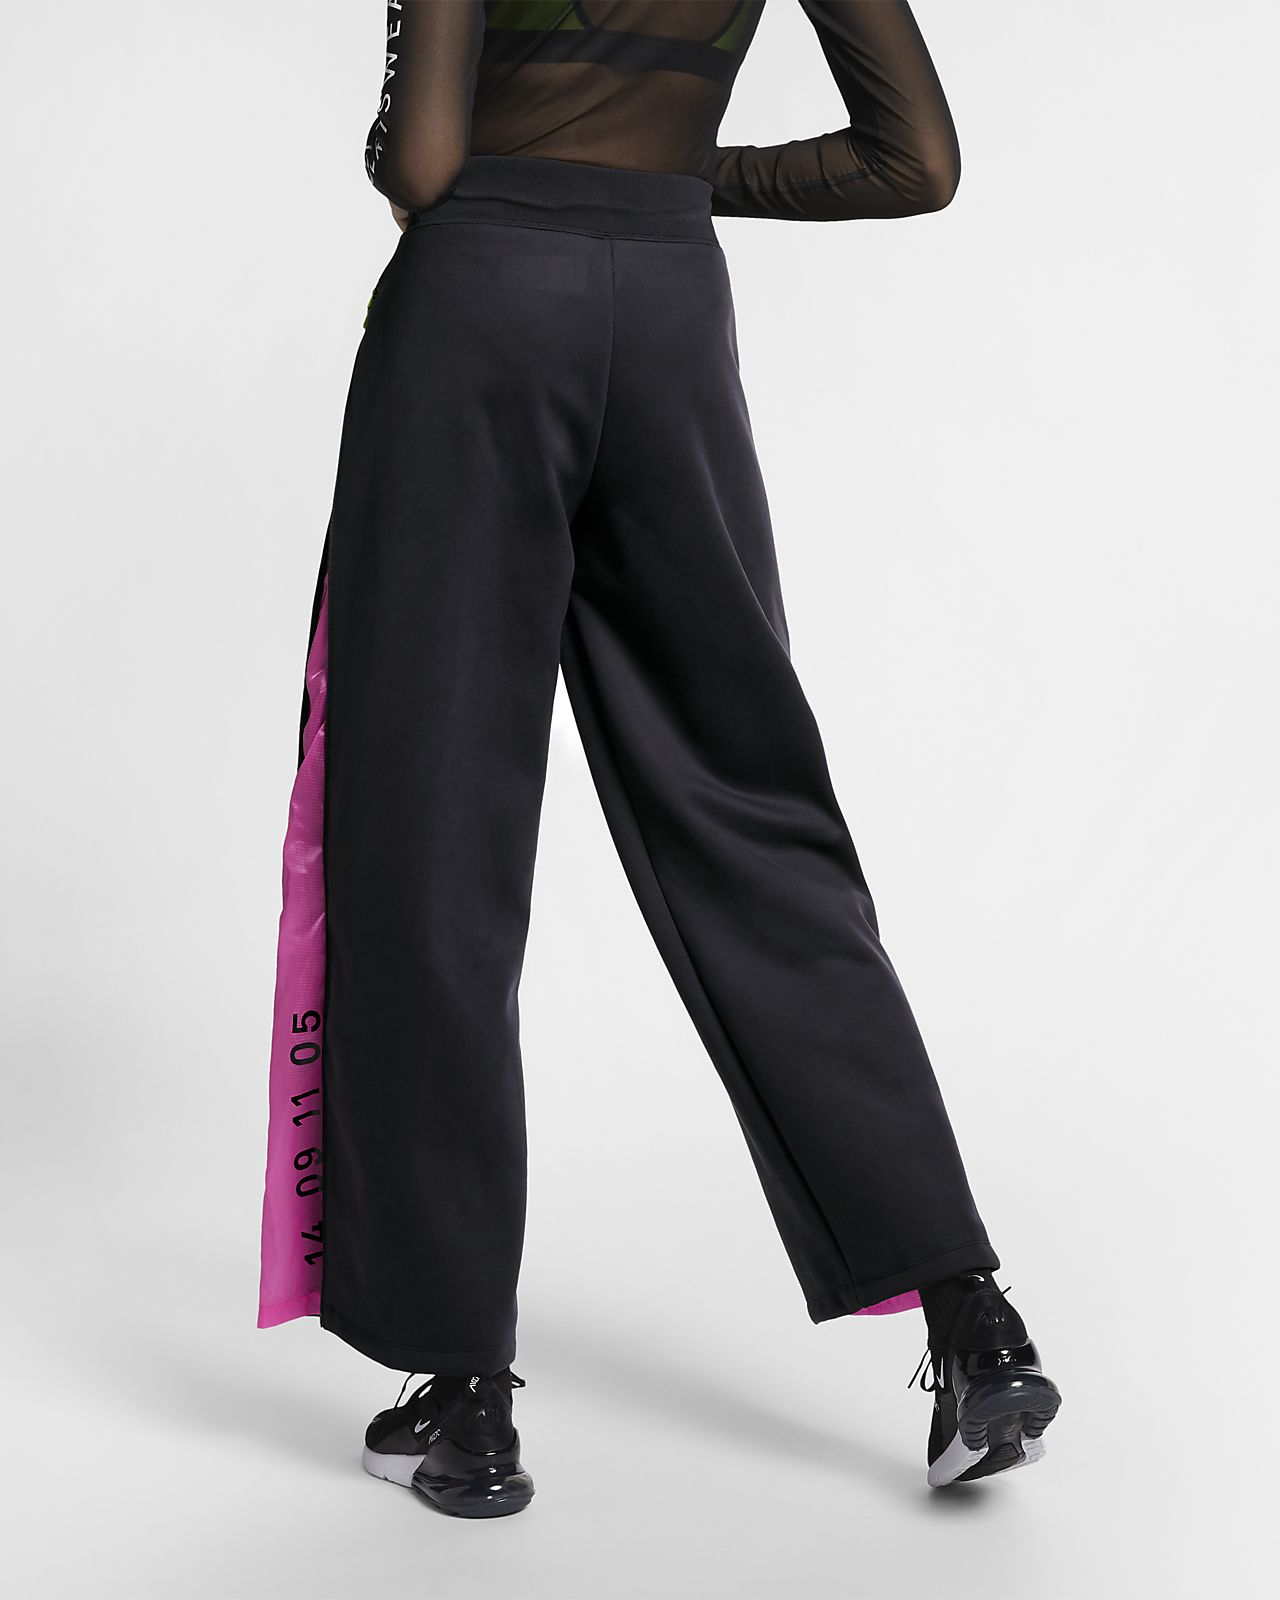 Nike Pantaloni Donna Sportwear Tech Fleece Nero Consegna